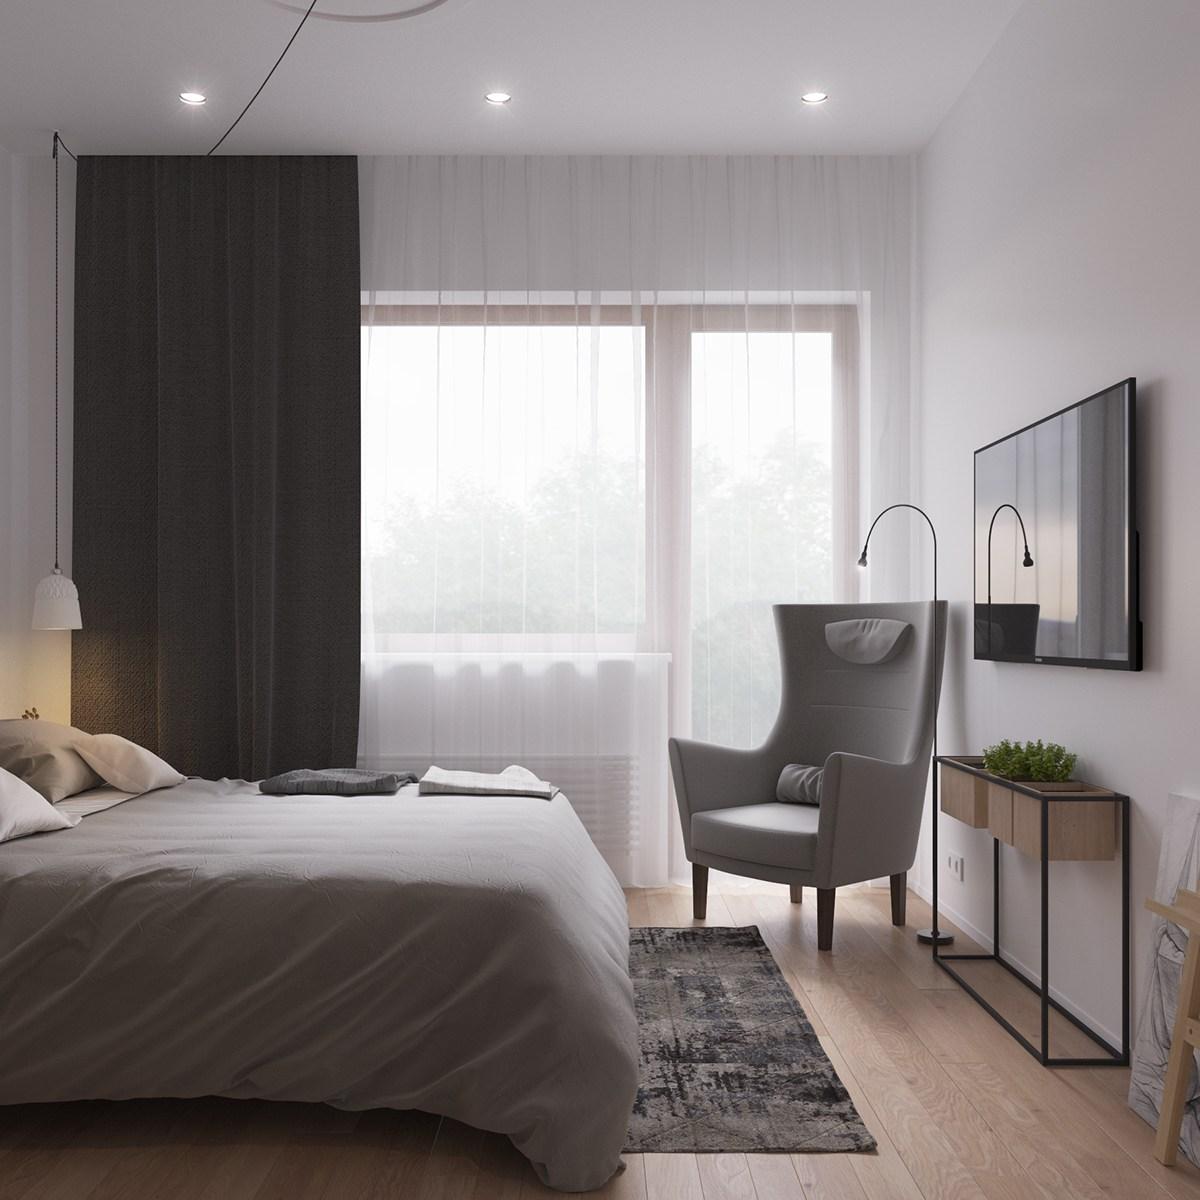 plantenbak-slaapkamer